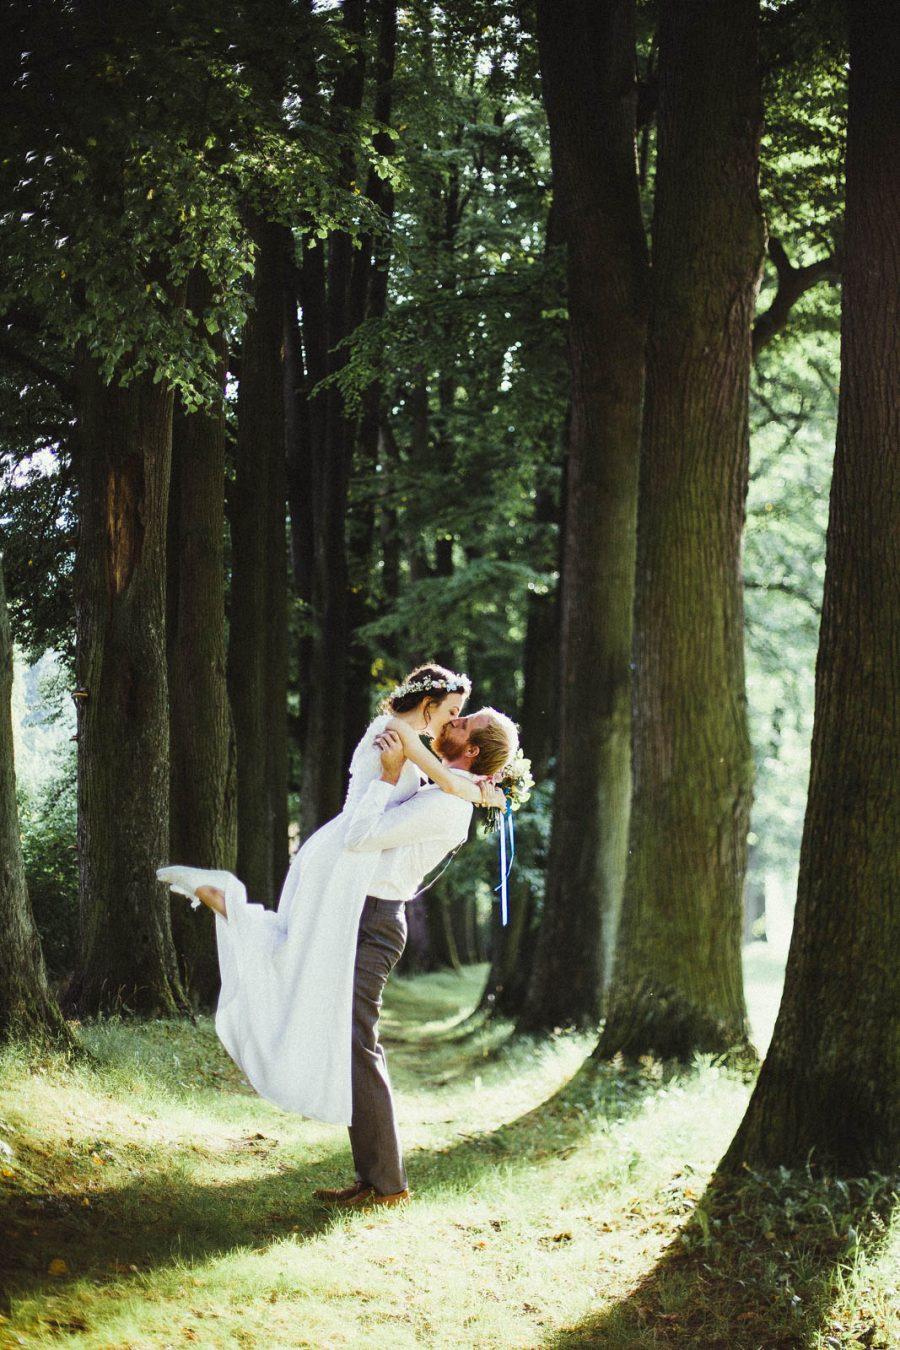 Edinburgh Alternative Wedding Photographer   Nature Photoshoot Elopement   Ceranna Photography